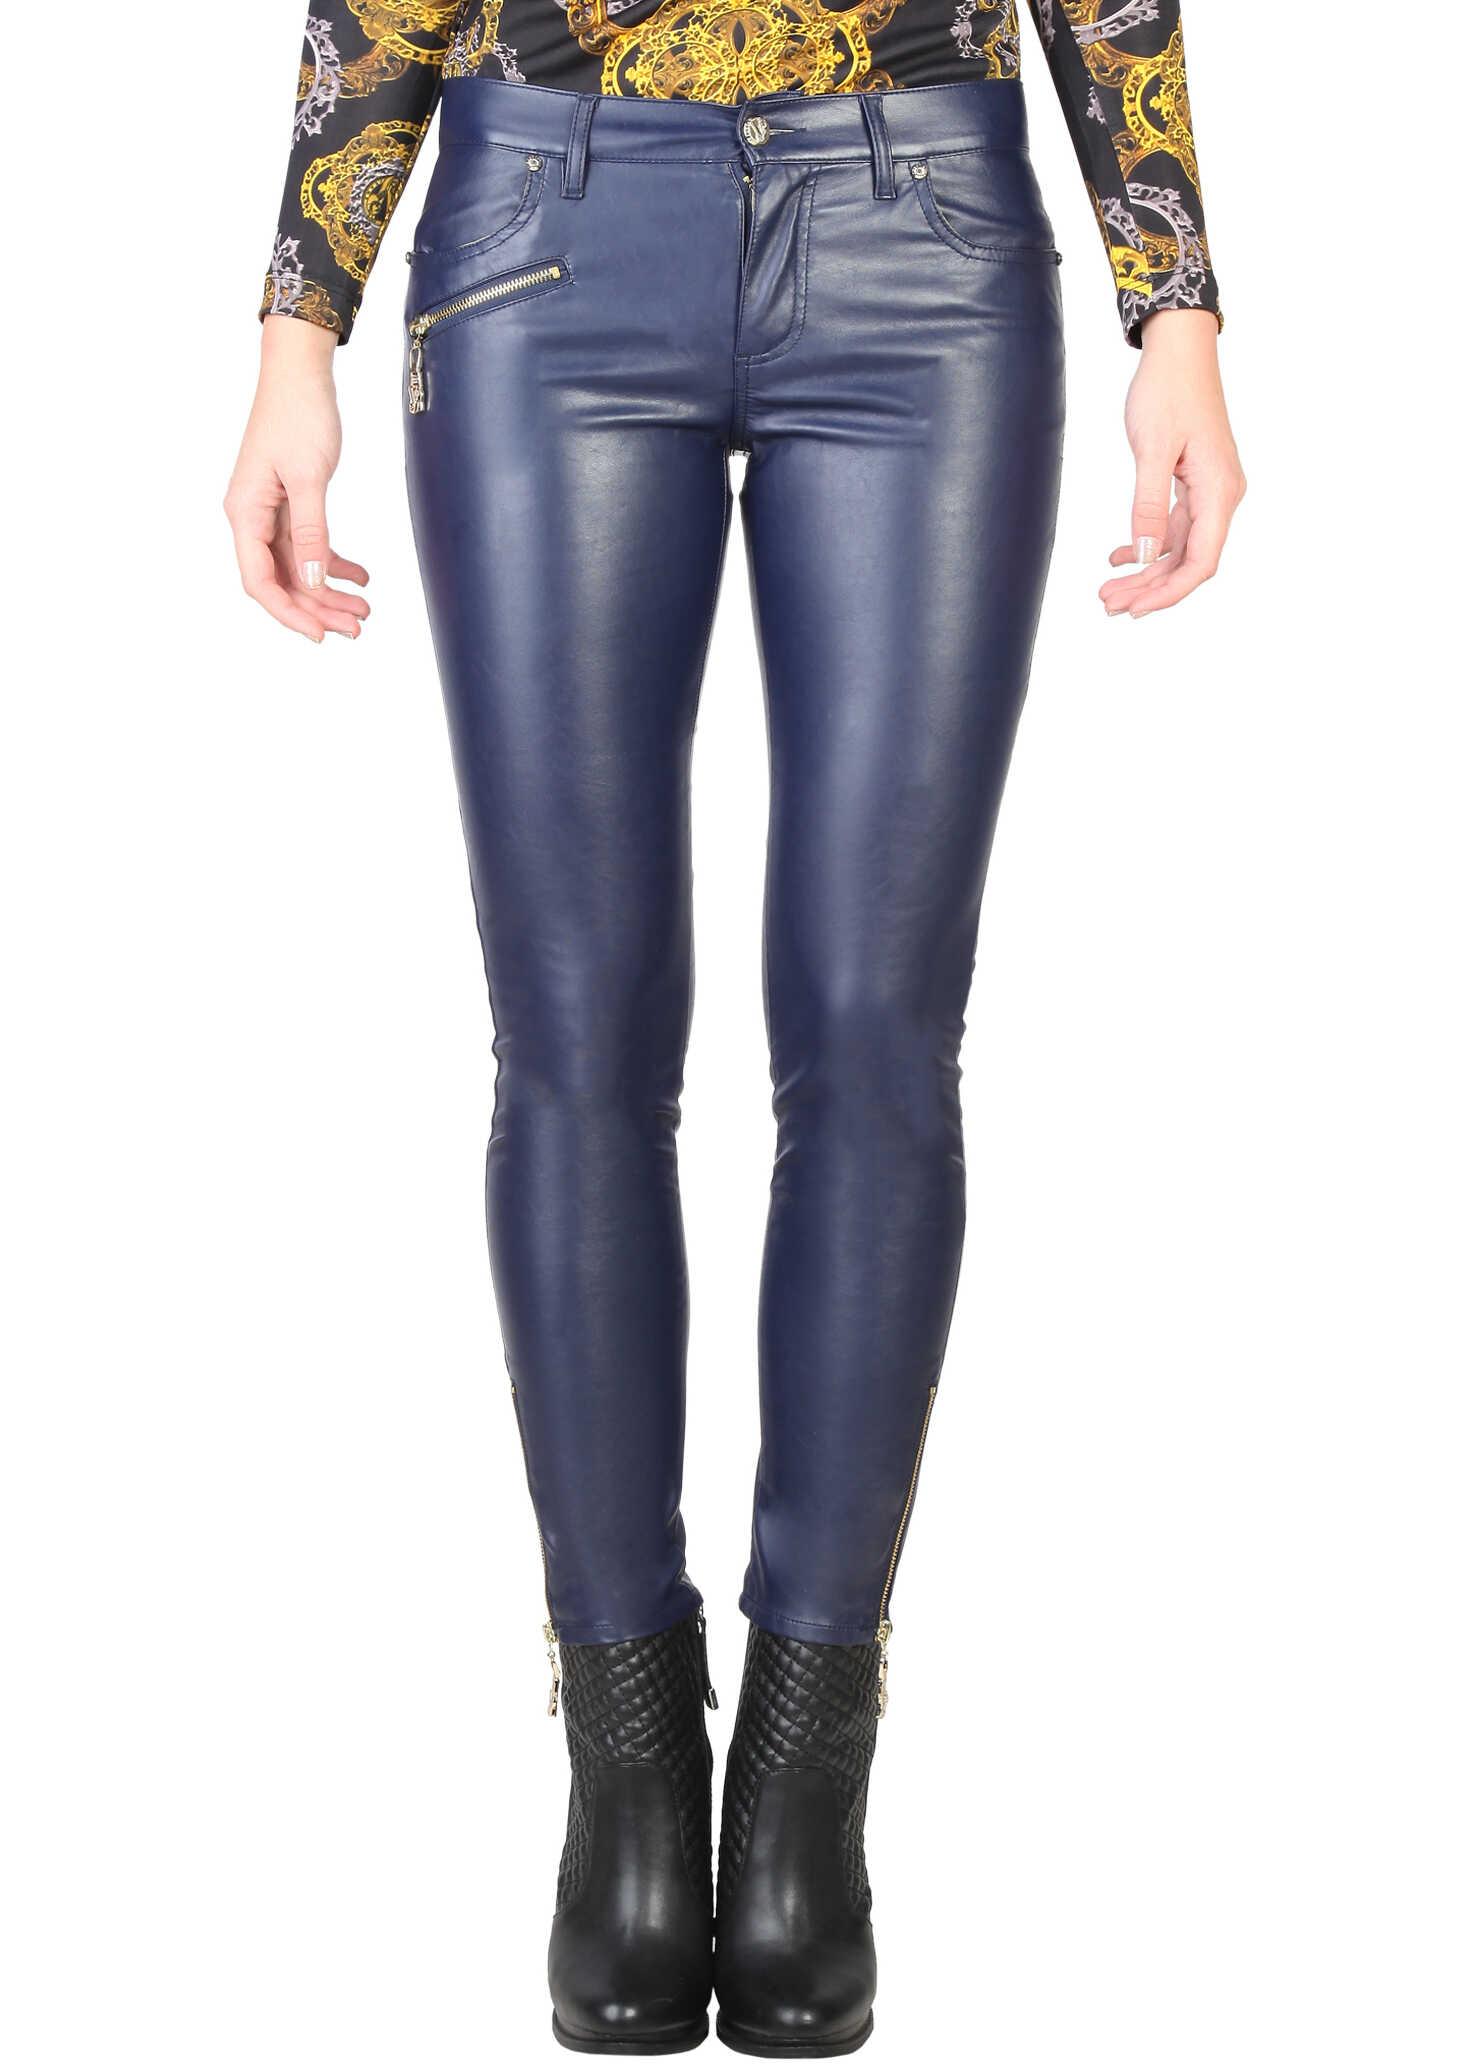 Versace Jeans A1Hmb0Ha Blue